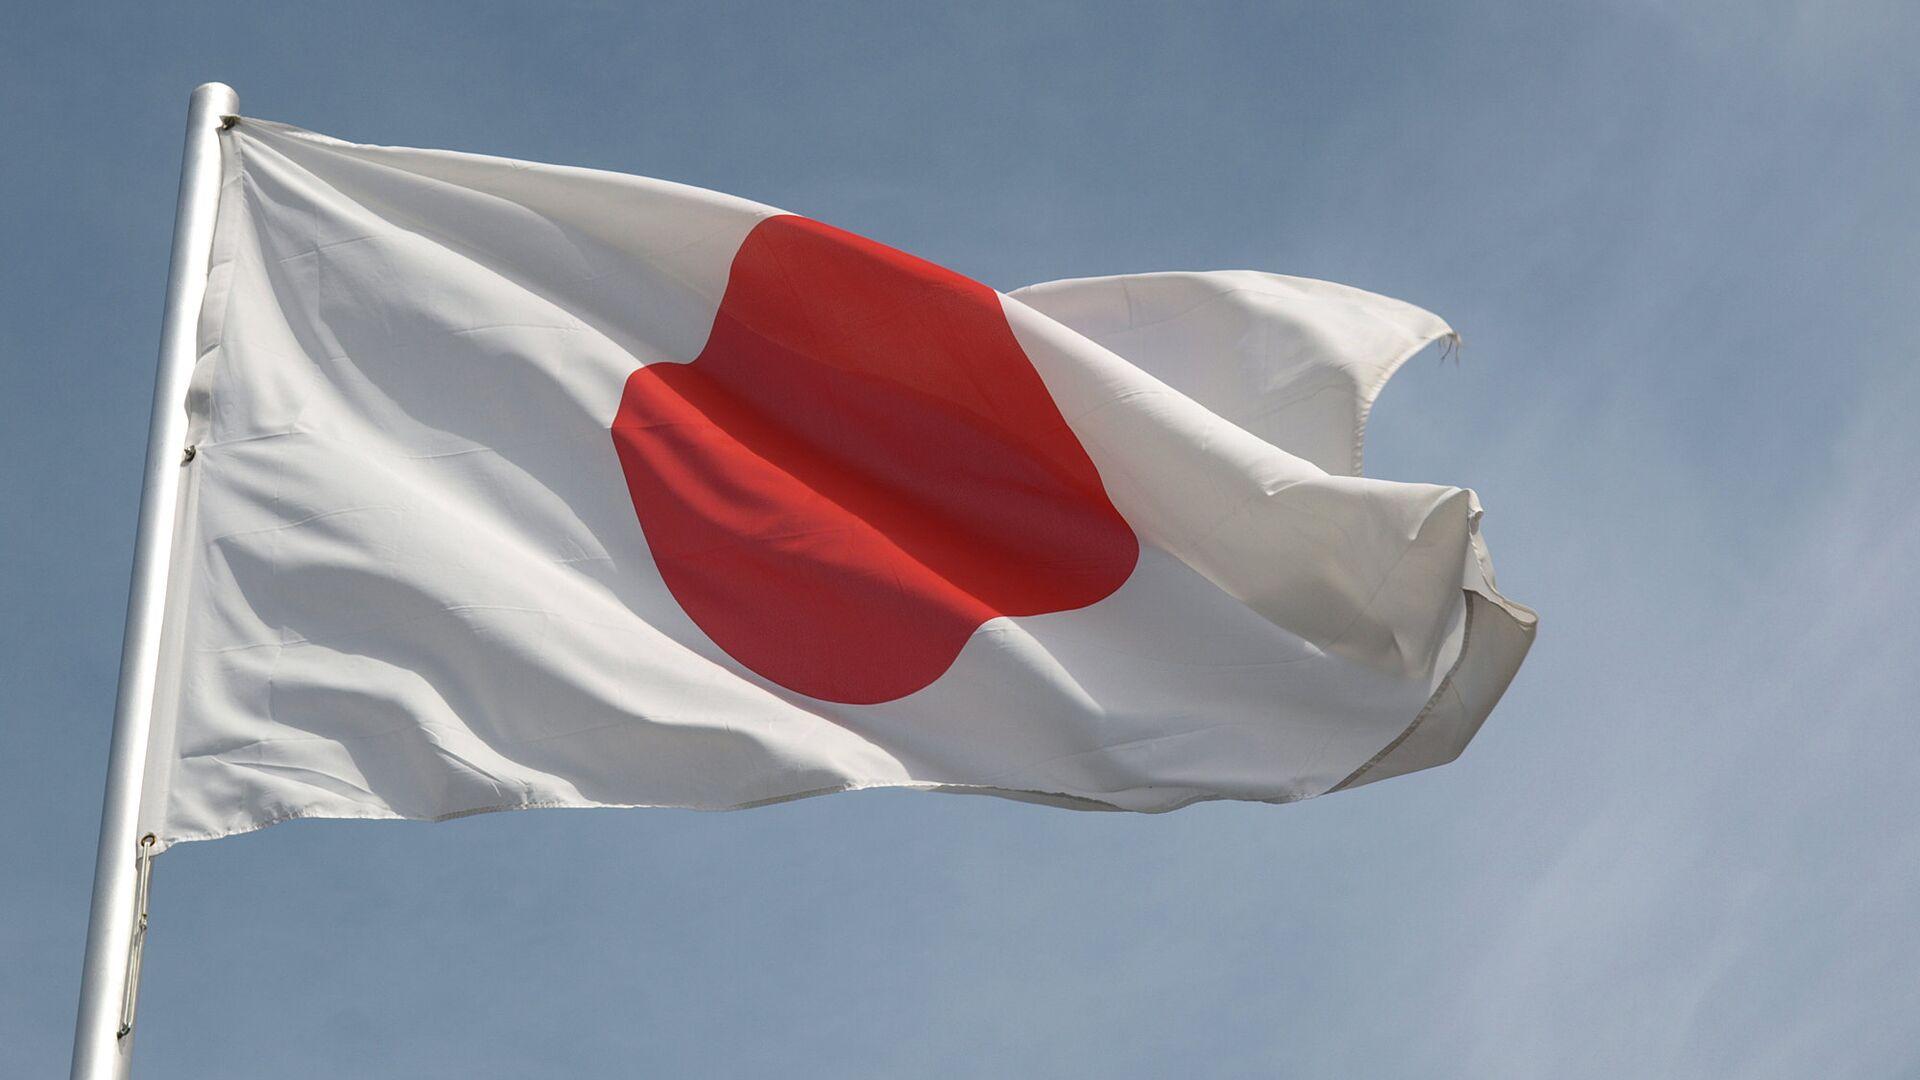 Флаг Японии - РИА Новости, 1920, 25.05.2021